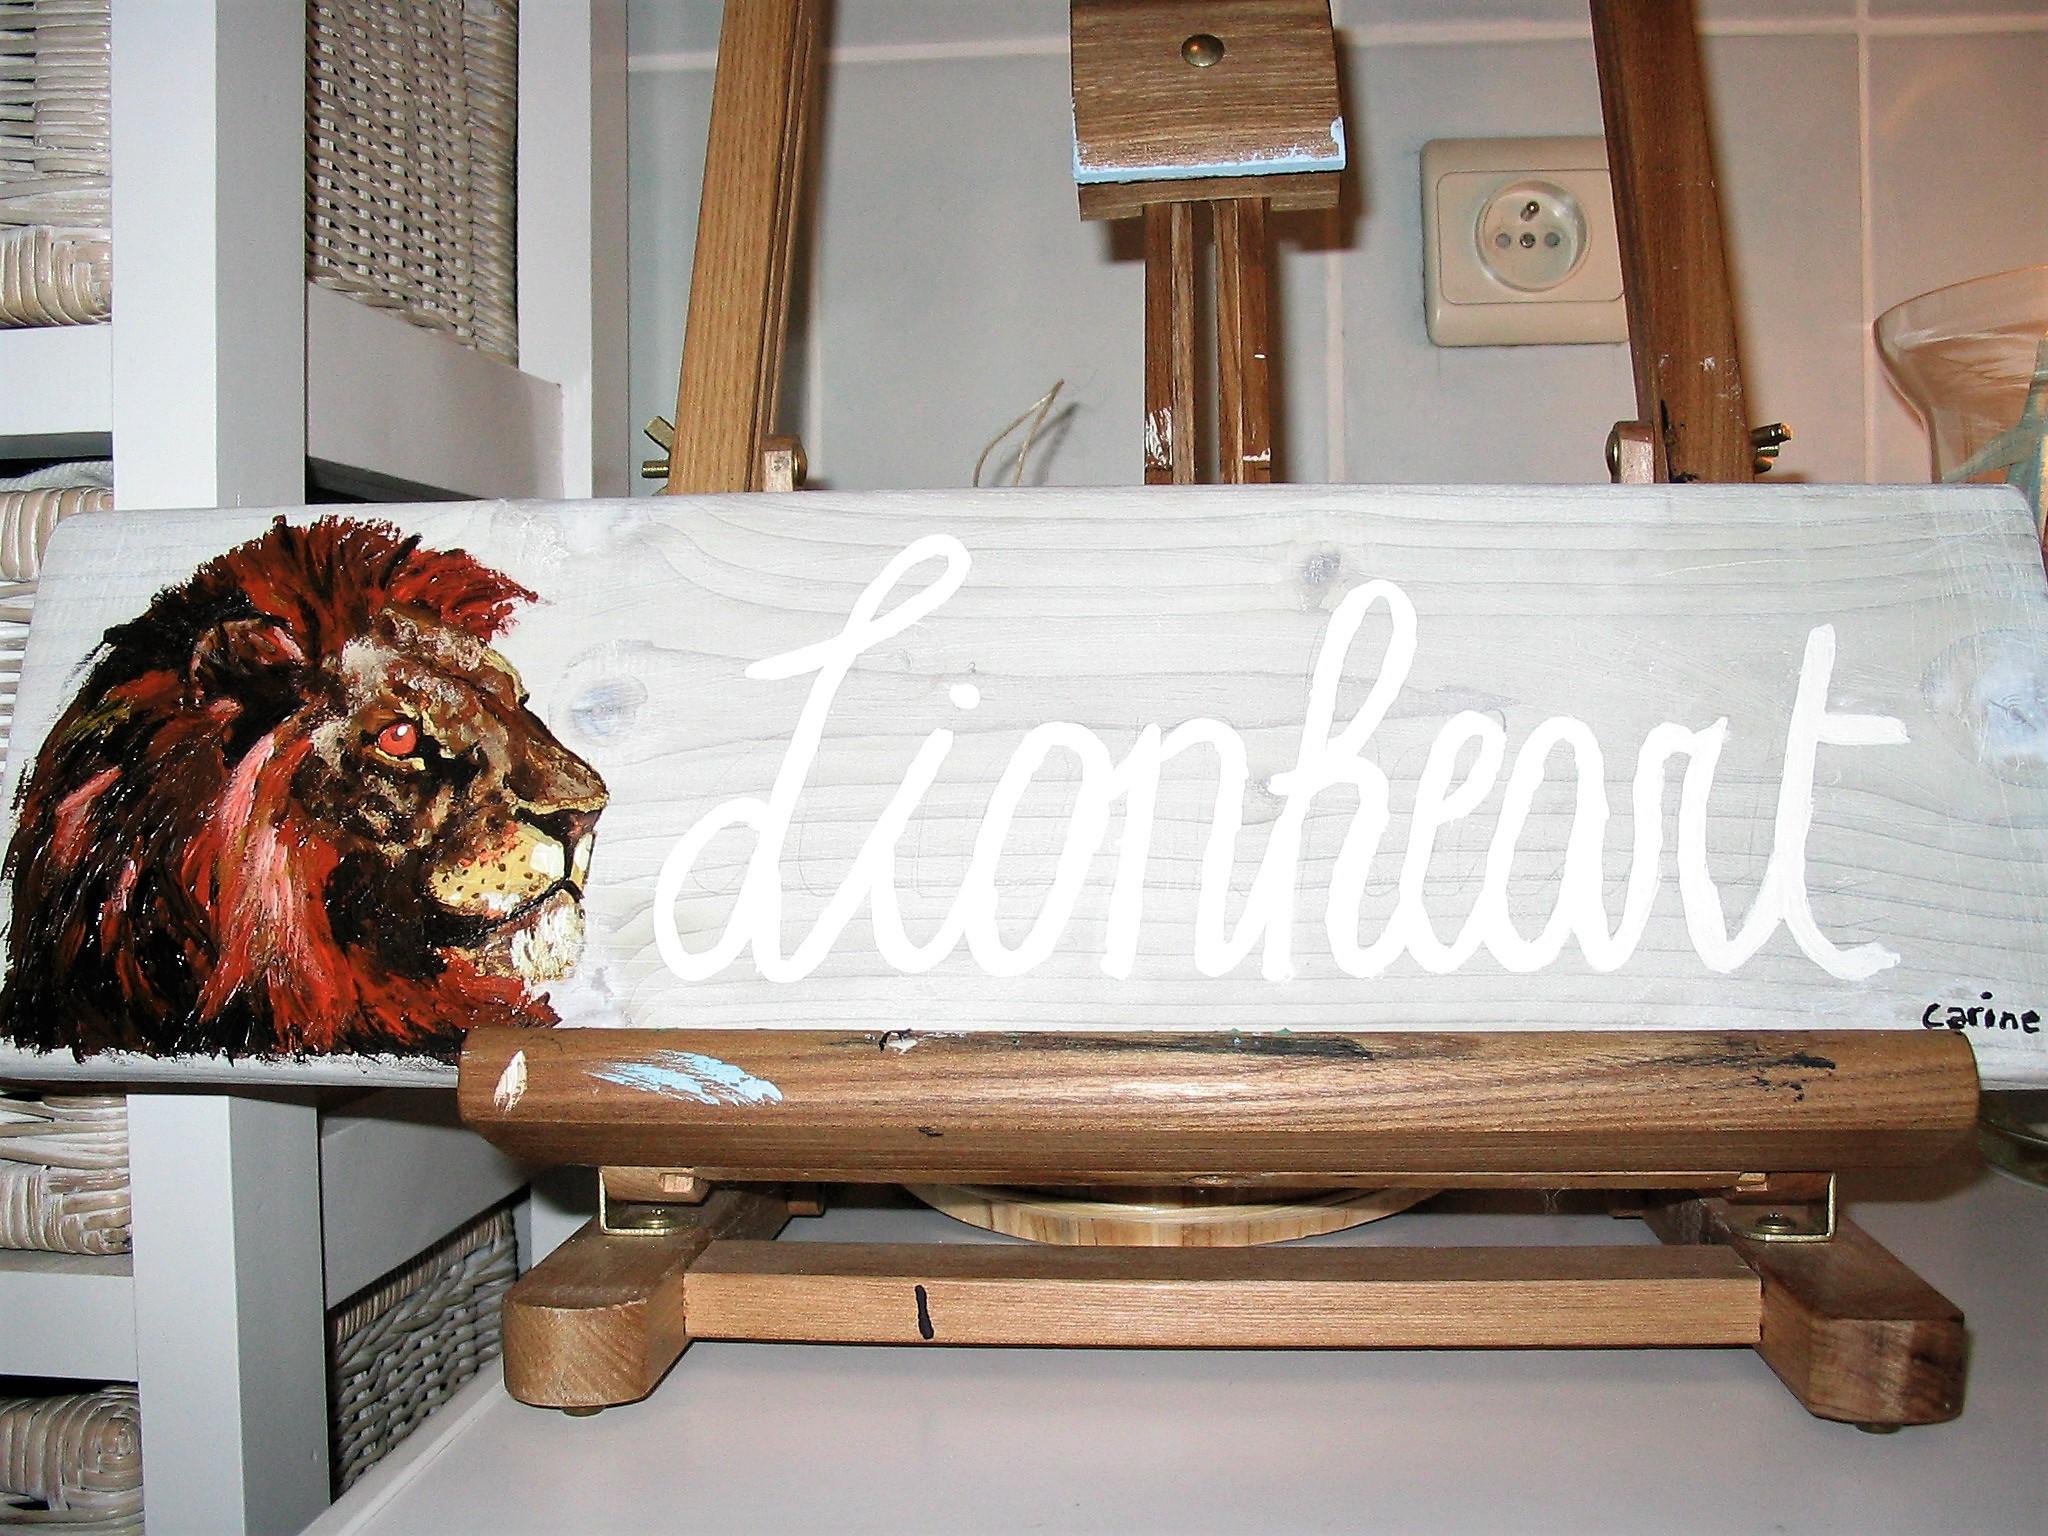 11.Lionheart